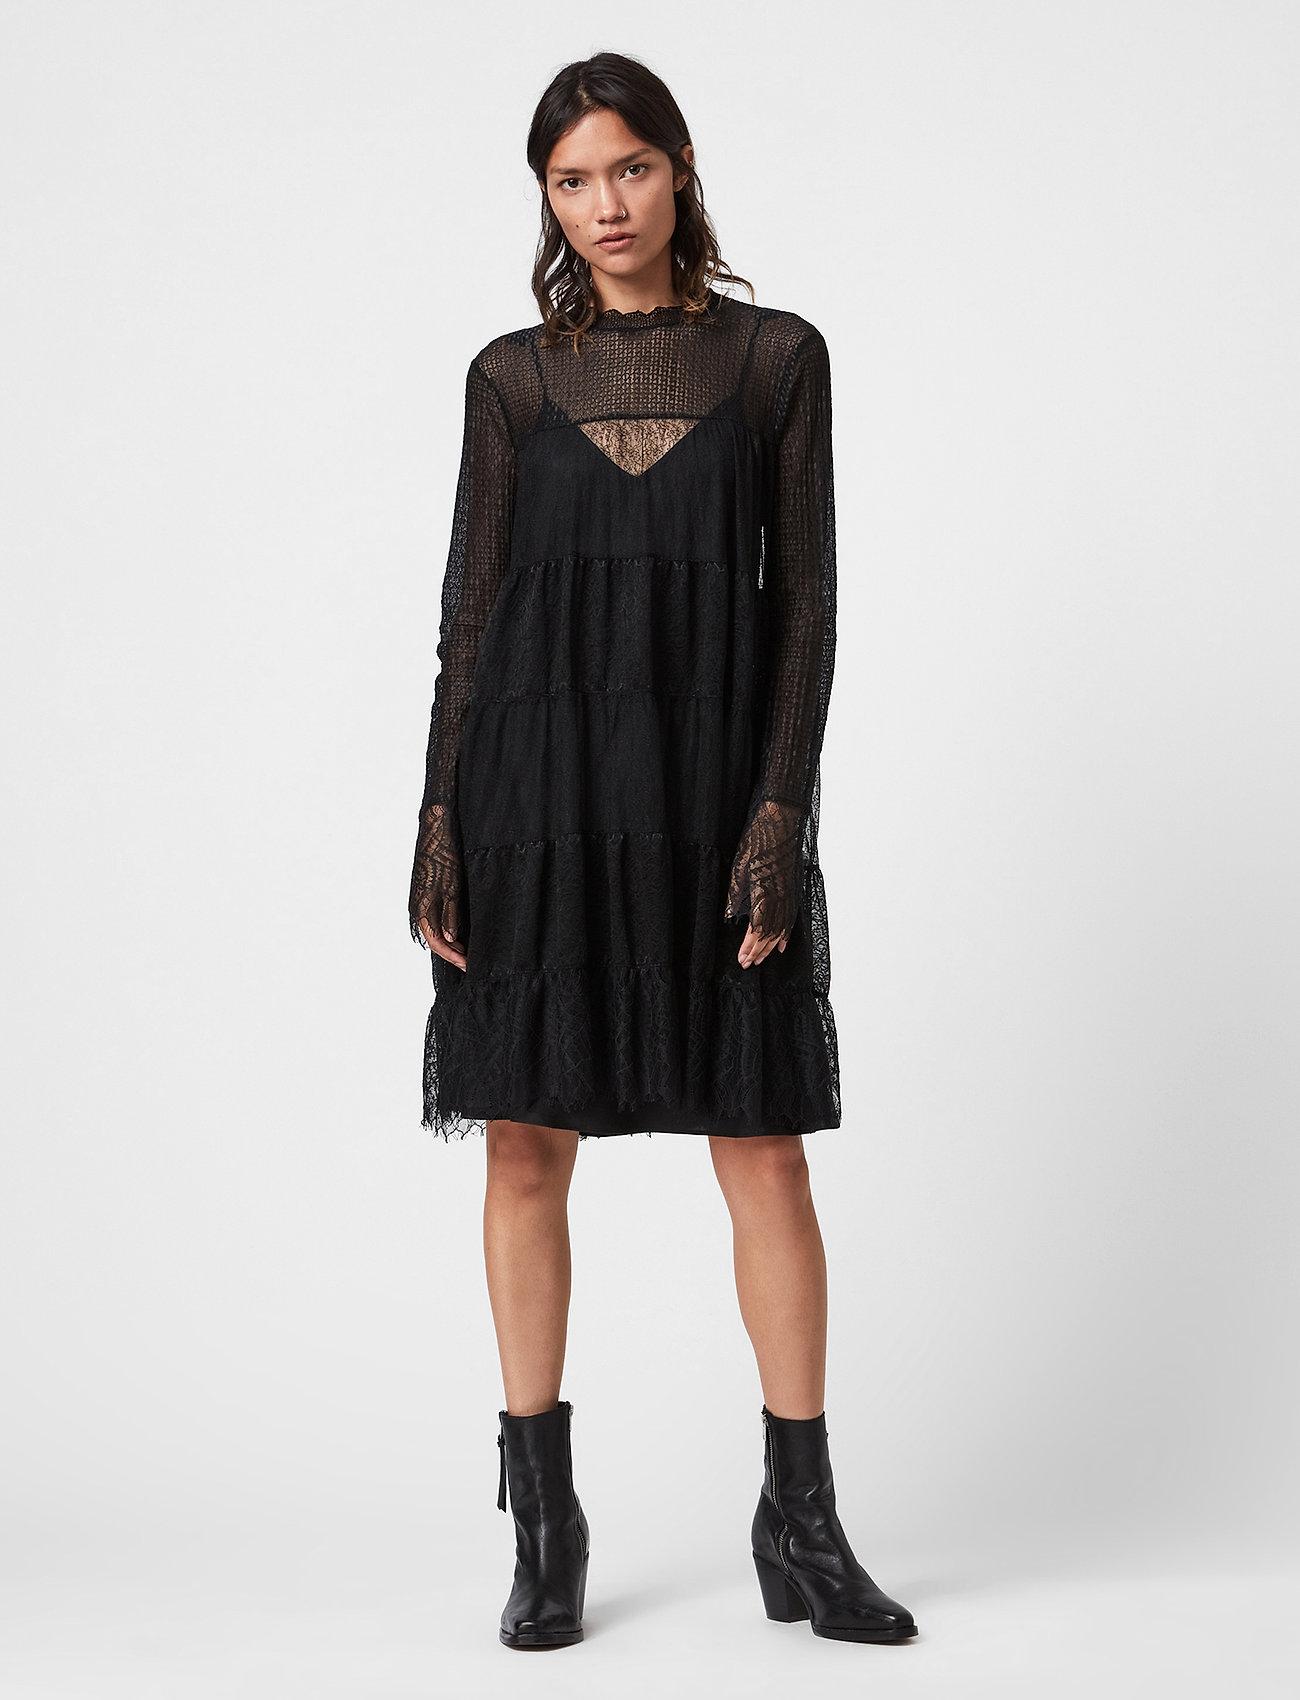 AllSaints - BRIELLA DRESS - blondekjoler - black - 0